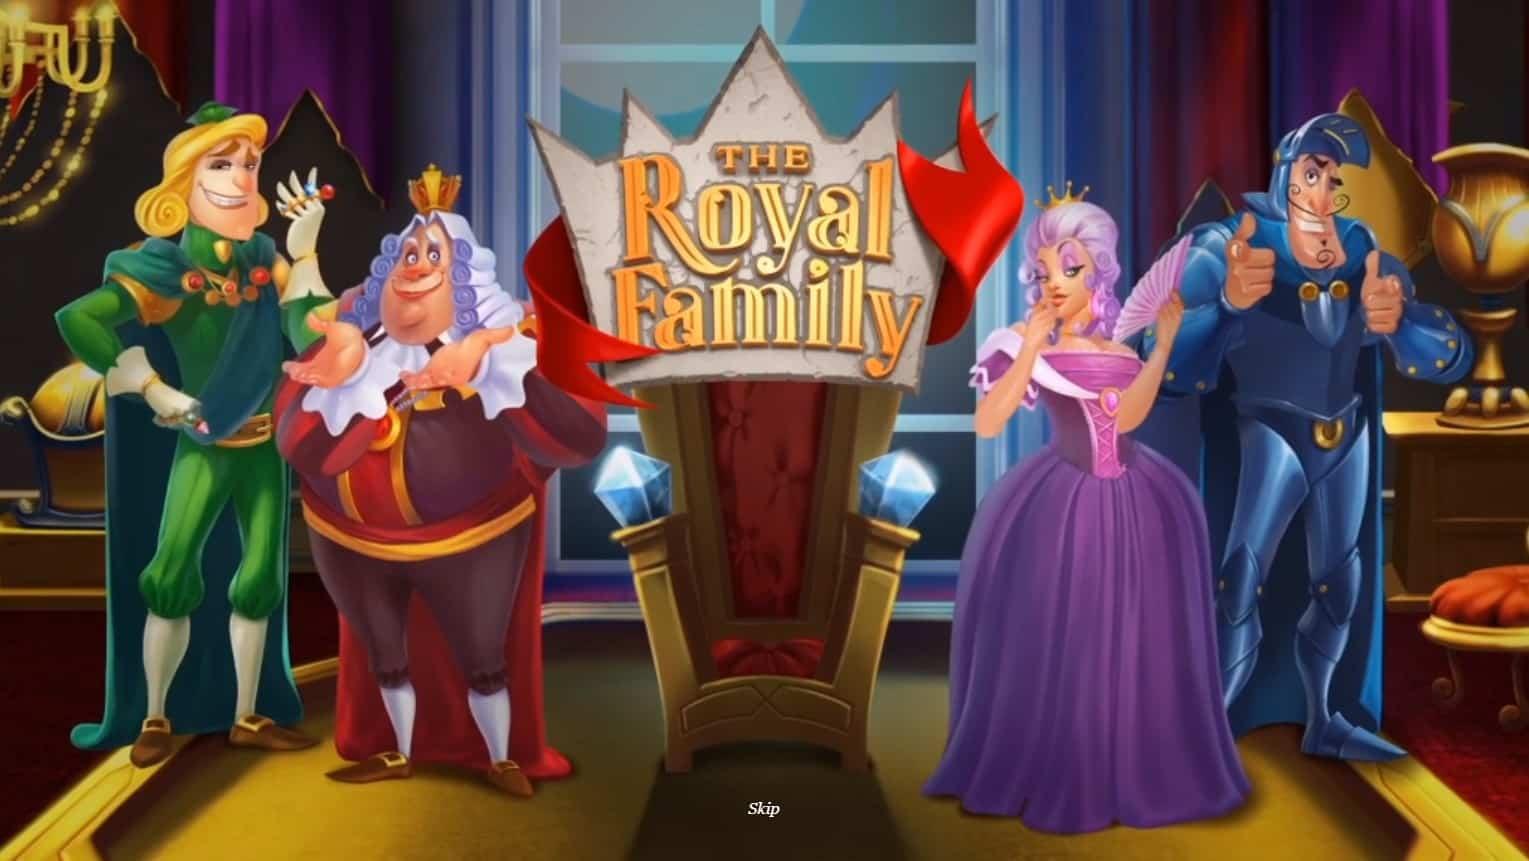 Royal Family Review